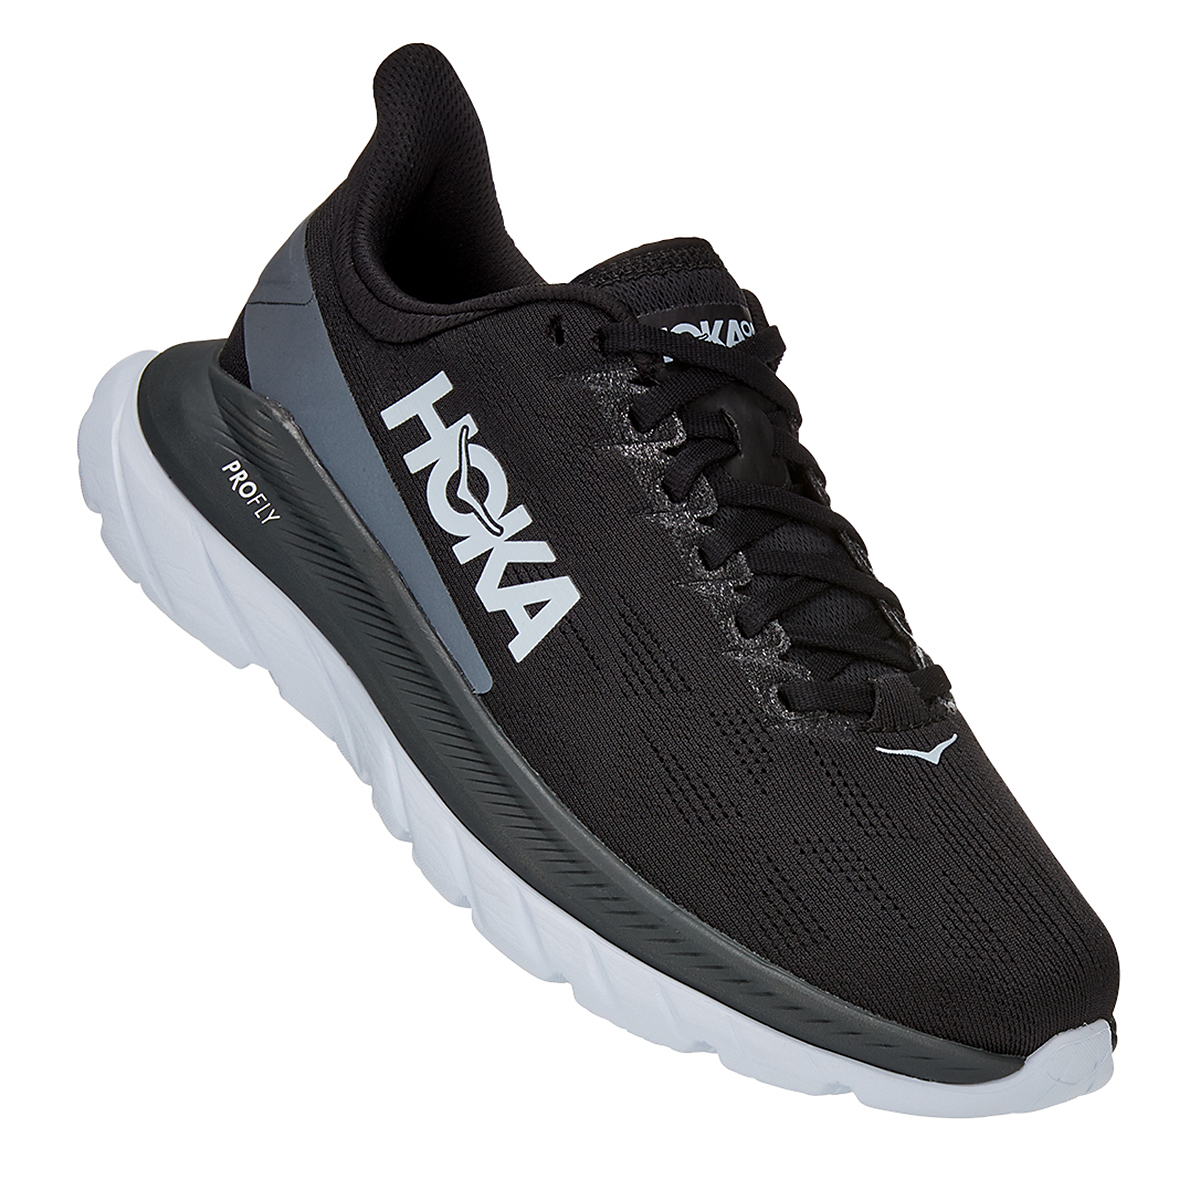 Women's Hoka One One Mach 4 Running Shoe - Color: Black/Dark Shadow - Size: 5 - Width: Regular, Black/Dark Shadow, large, image 5